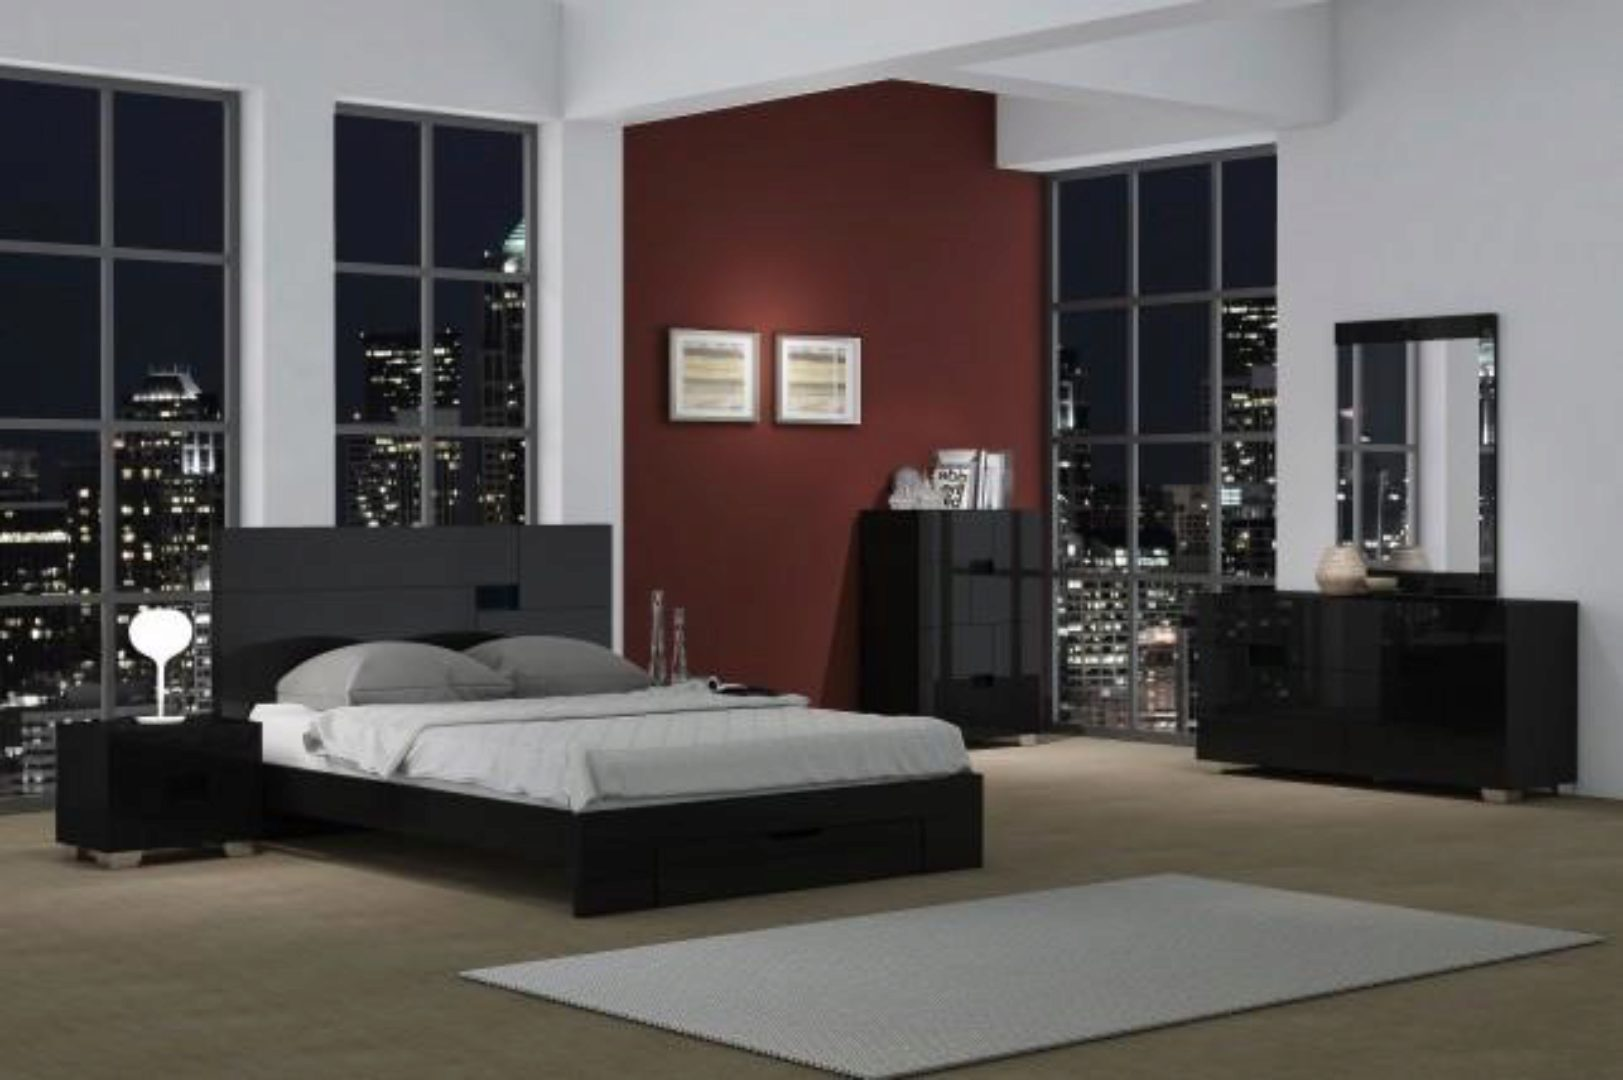 Black High Gloss Finish Queen Bedroom Set 3Pcs Modern ...